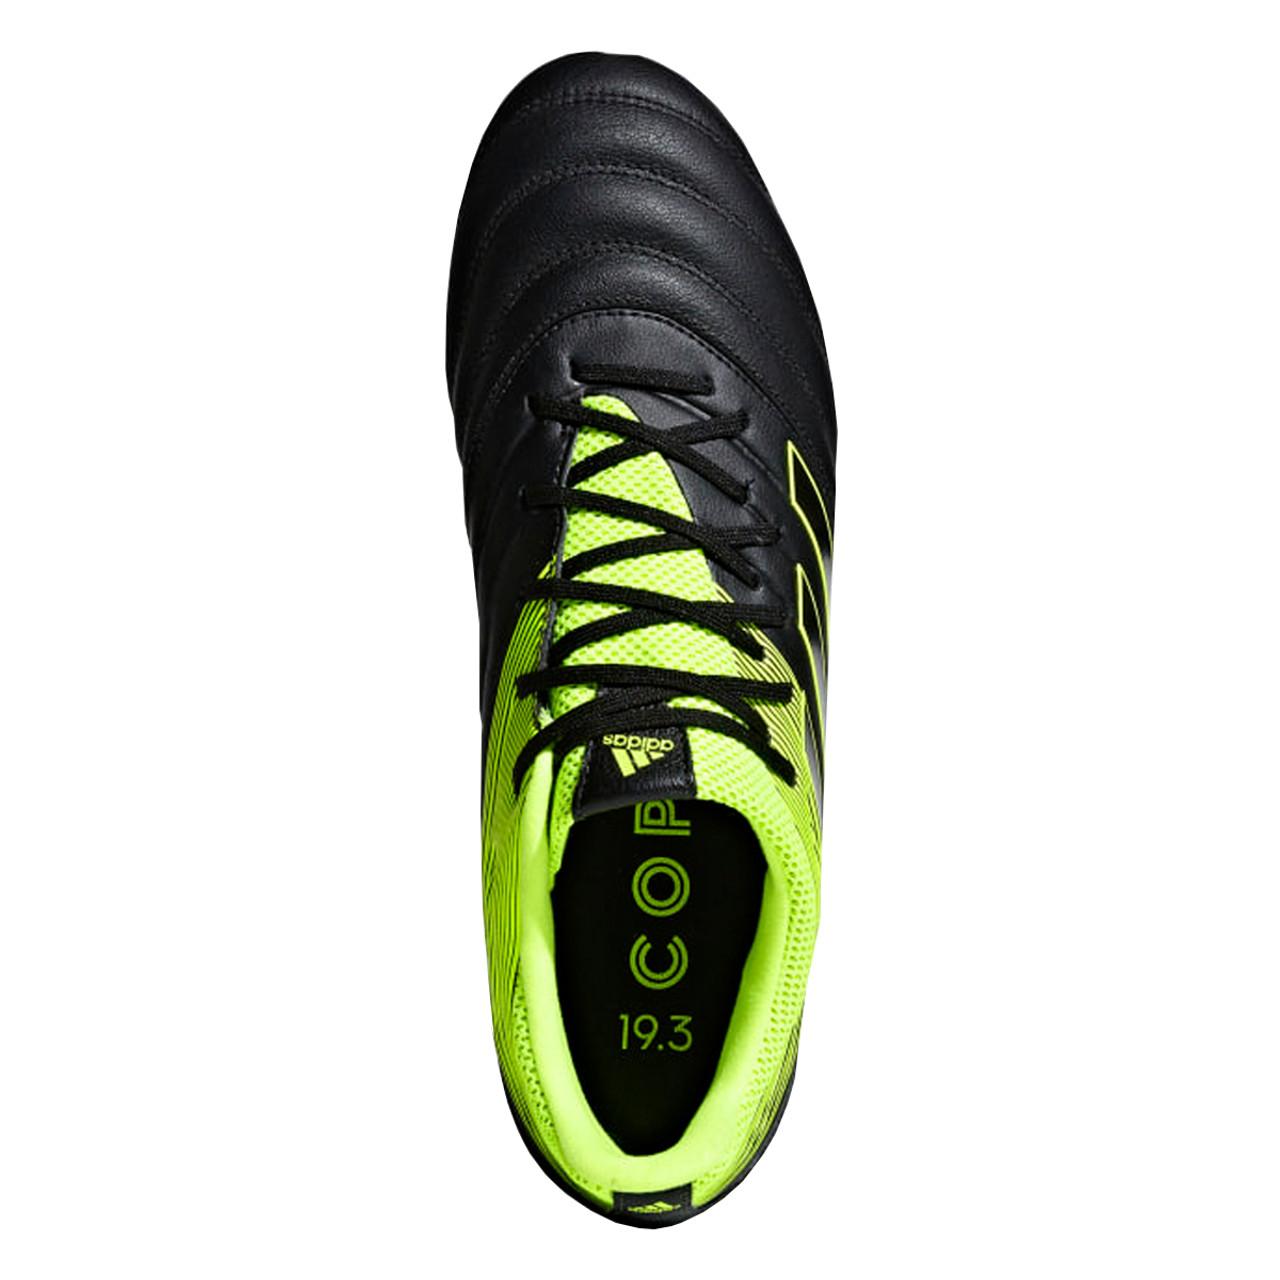 19b18859db8 ... Adidas Copa 19.3 FG Men s Soccer Cleats BB8090 - Black